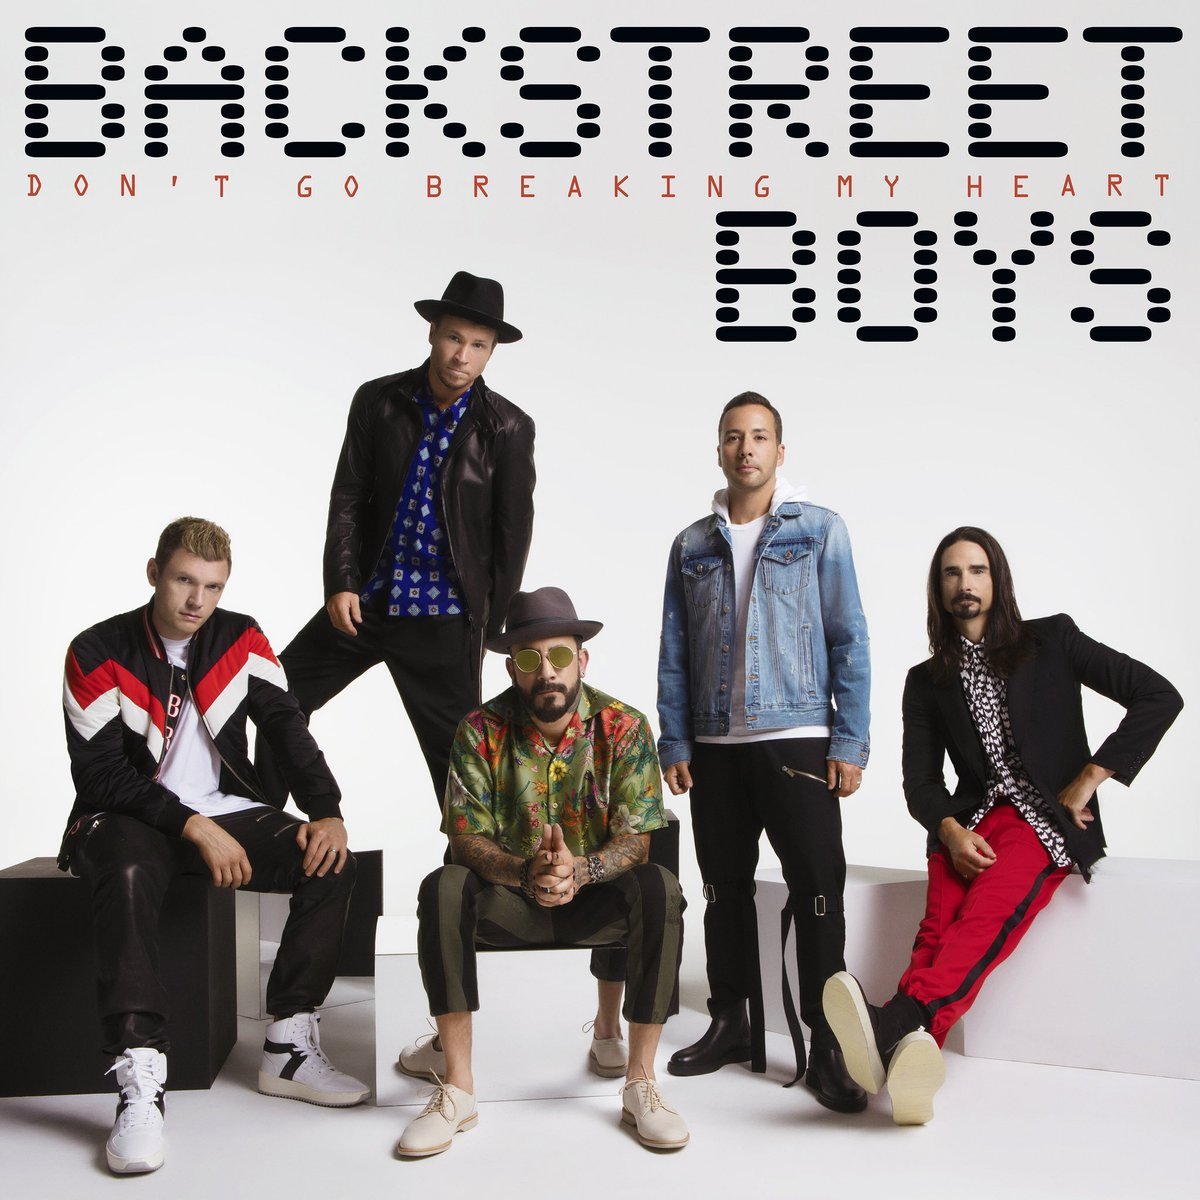 fot. Twitter/Backstreet Boys